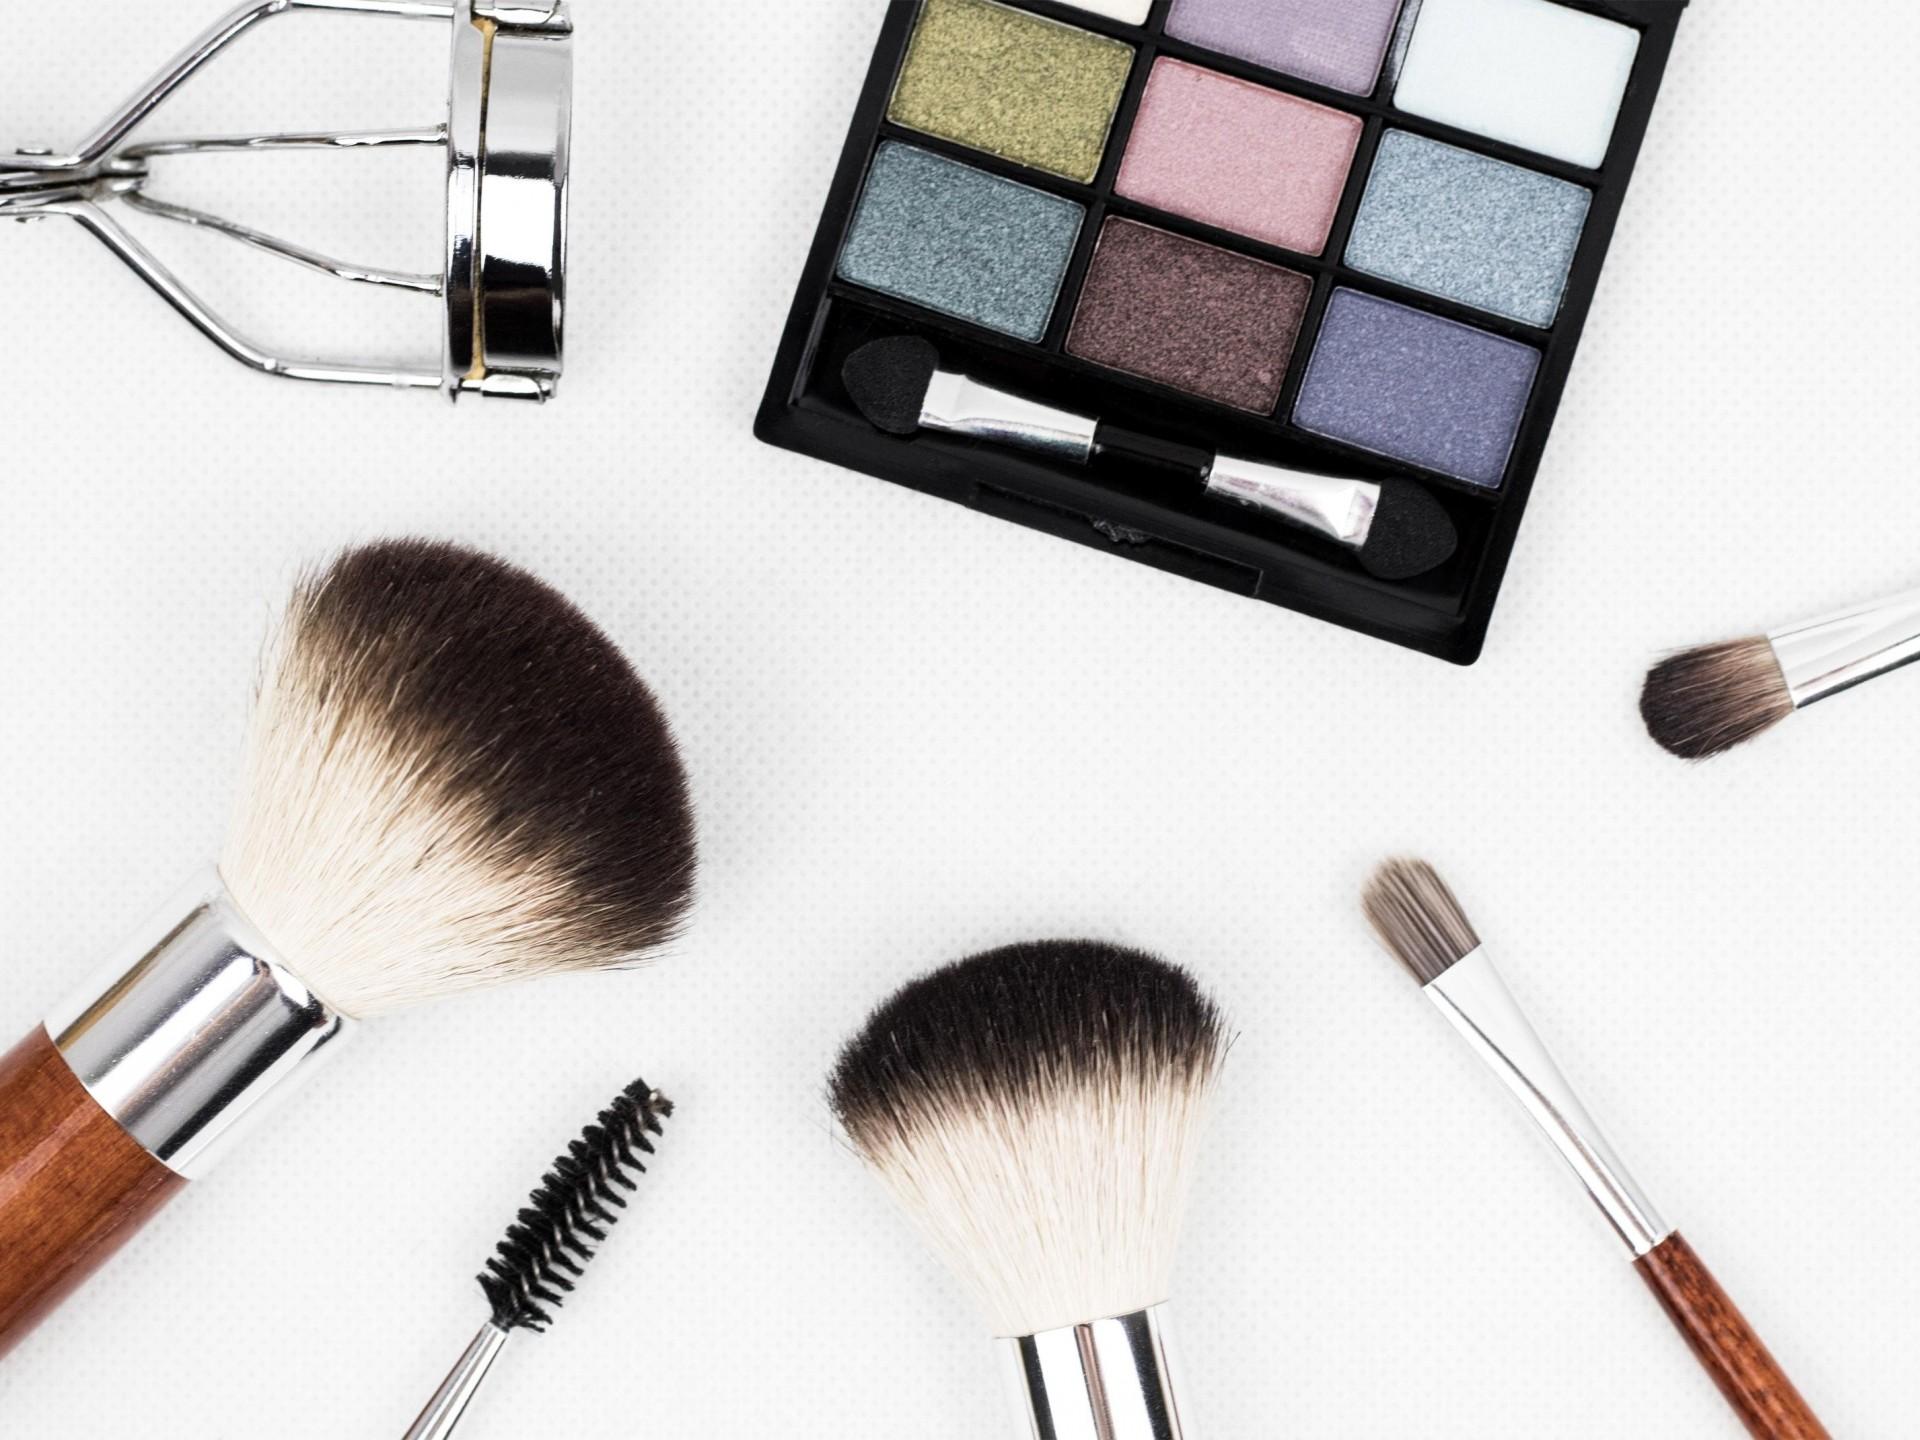 Multi Award Winning Hair, Beauty, Makeup, IPL Laser